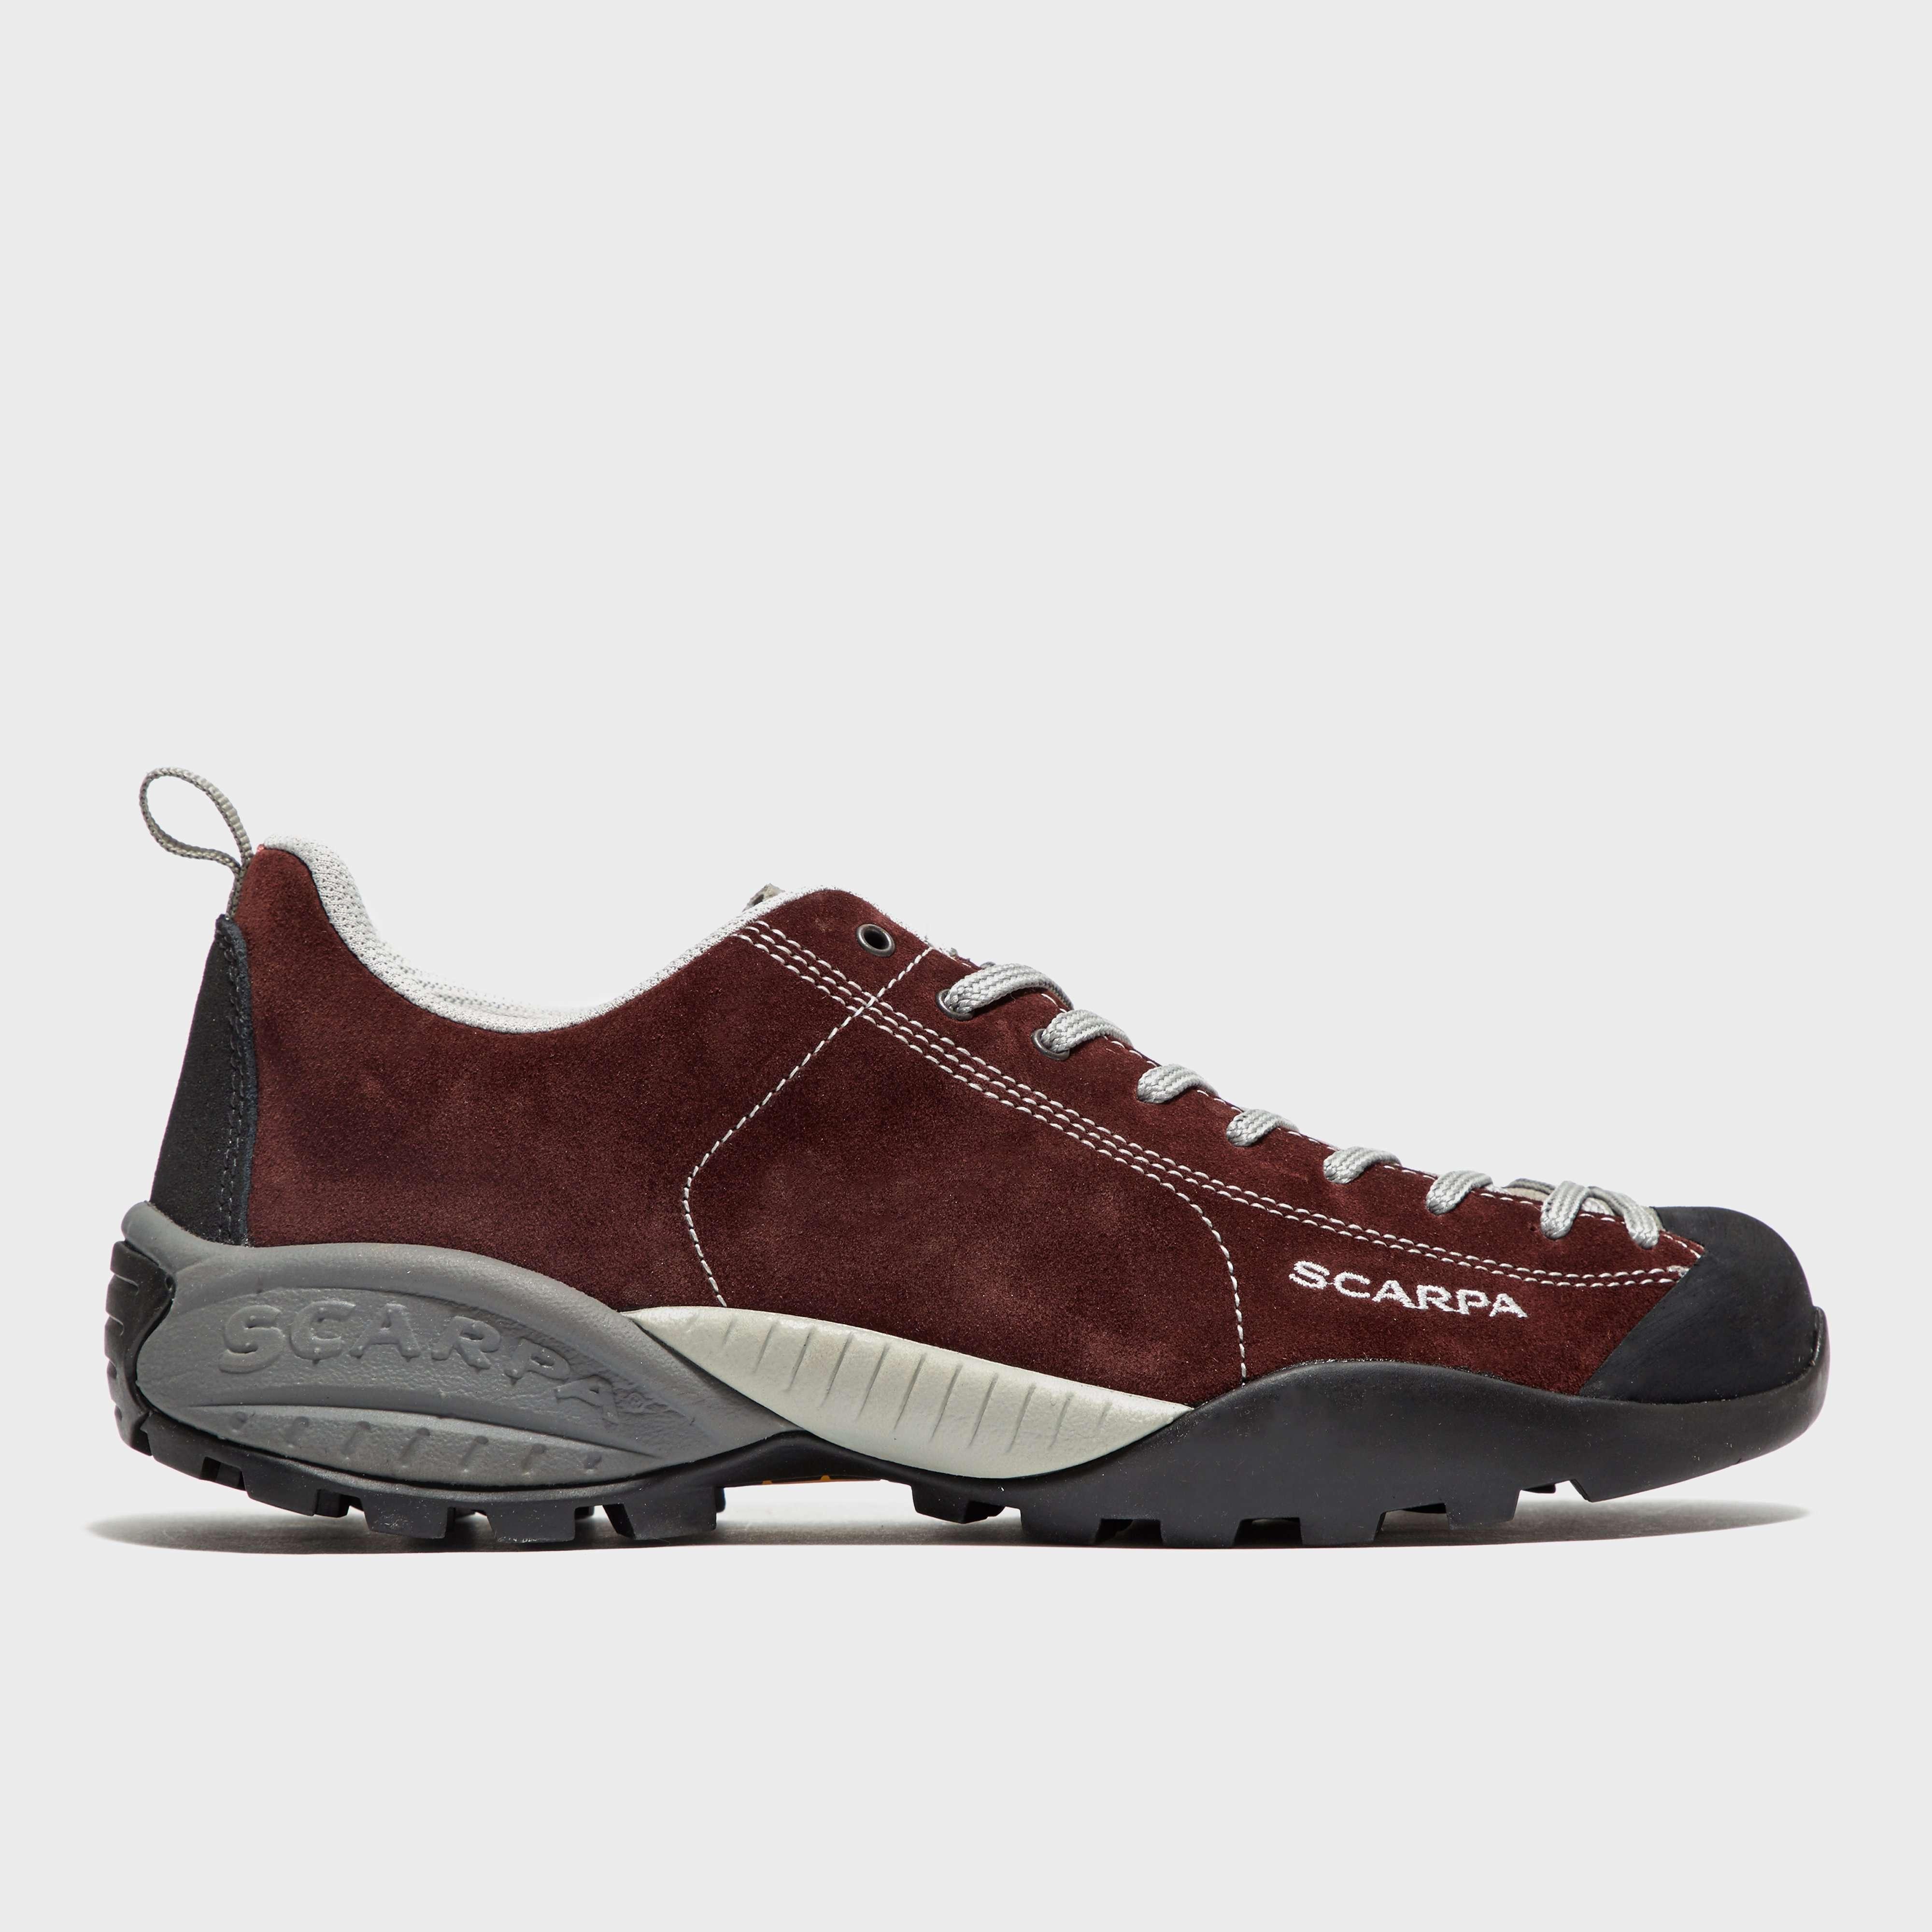 SCARPA Women's Mojito Shoes